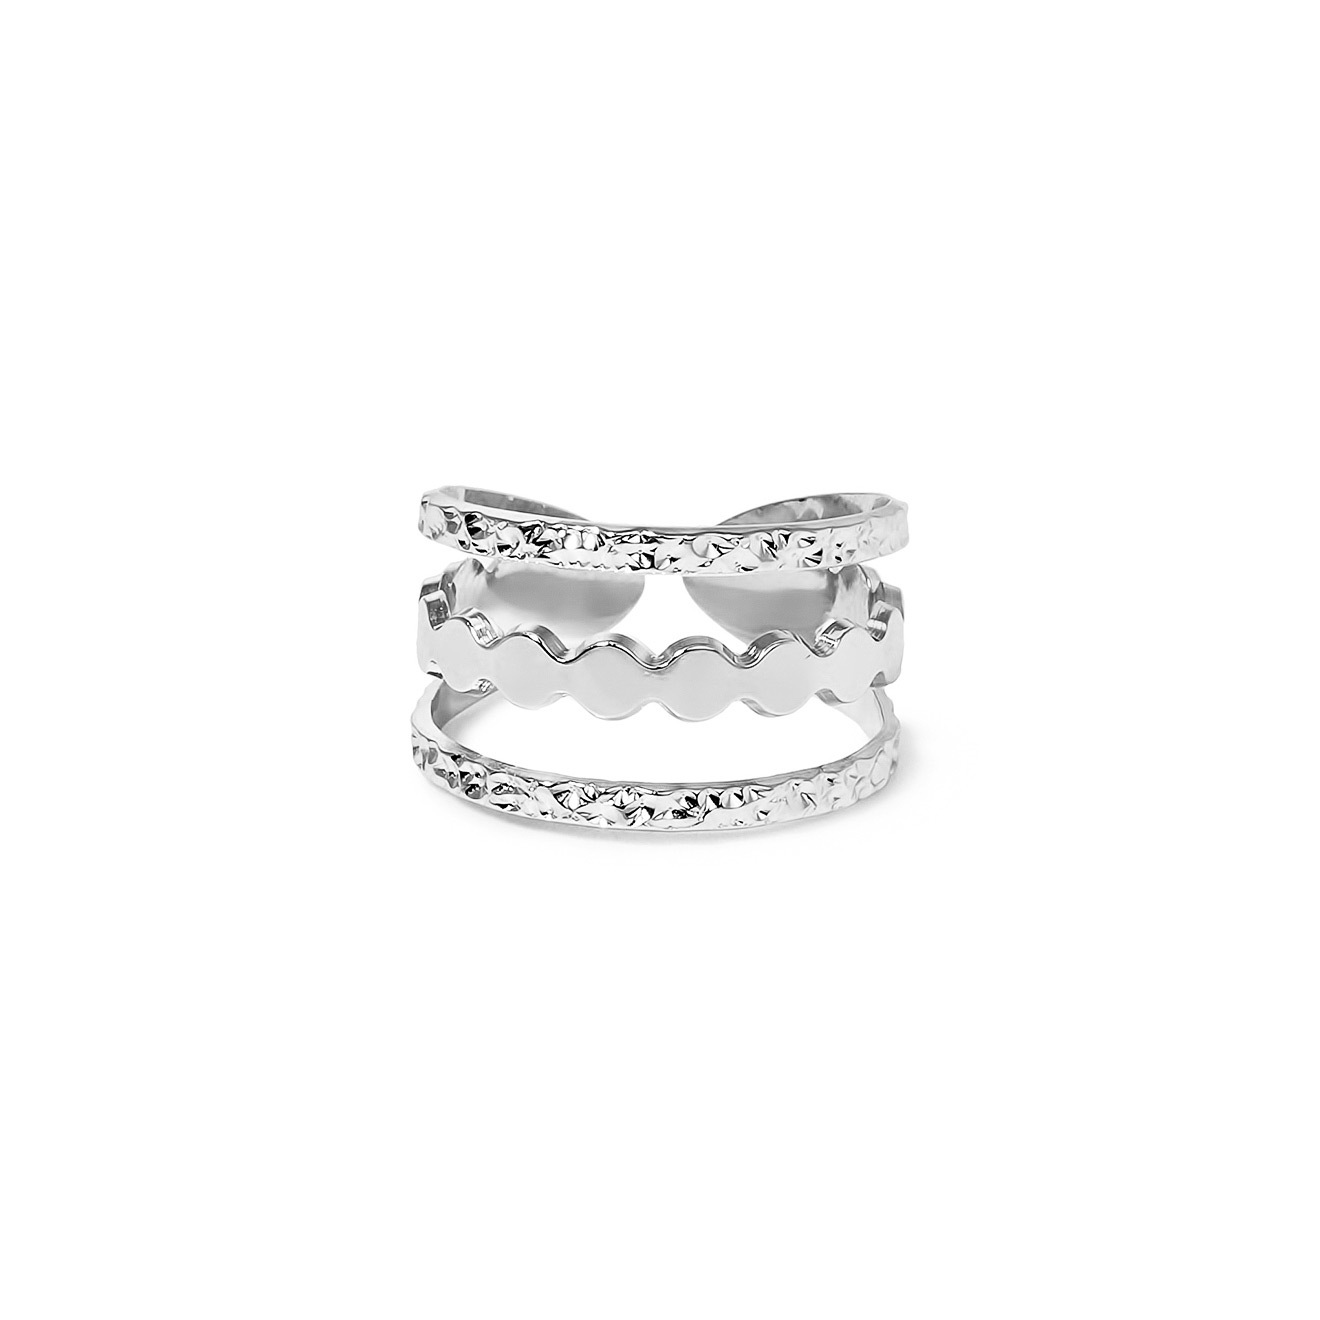 Mya Bay Покрытое серебром кольцо Manhattan-Rounds